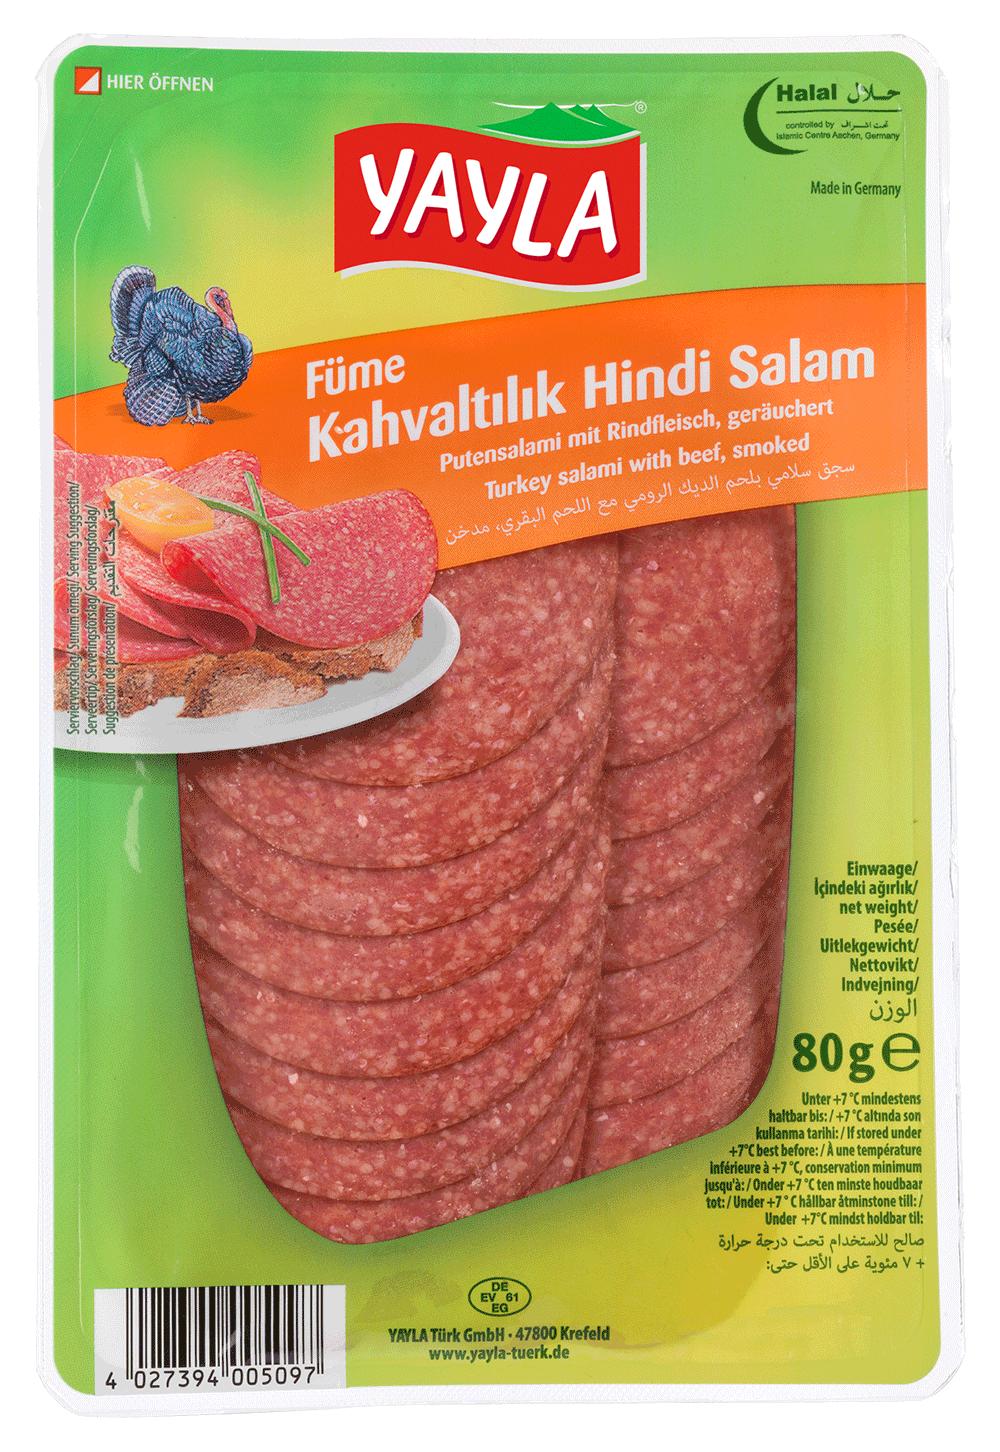 Yayla Kahvaltilik Hindi Salami / Putensalami 80g